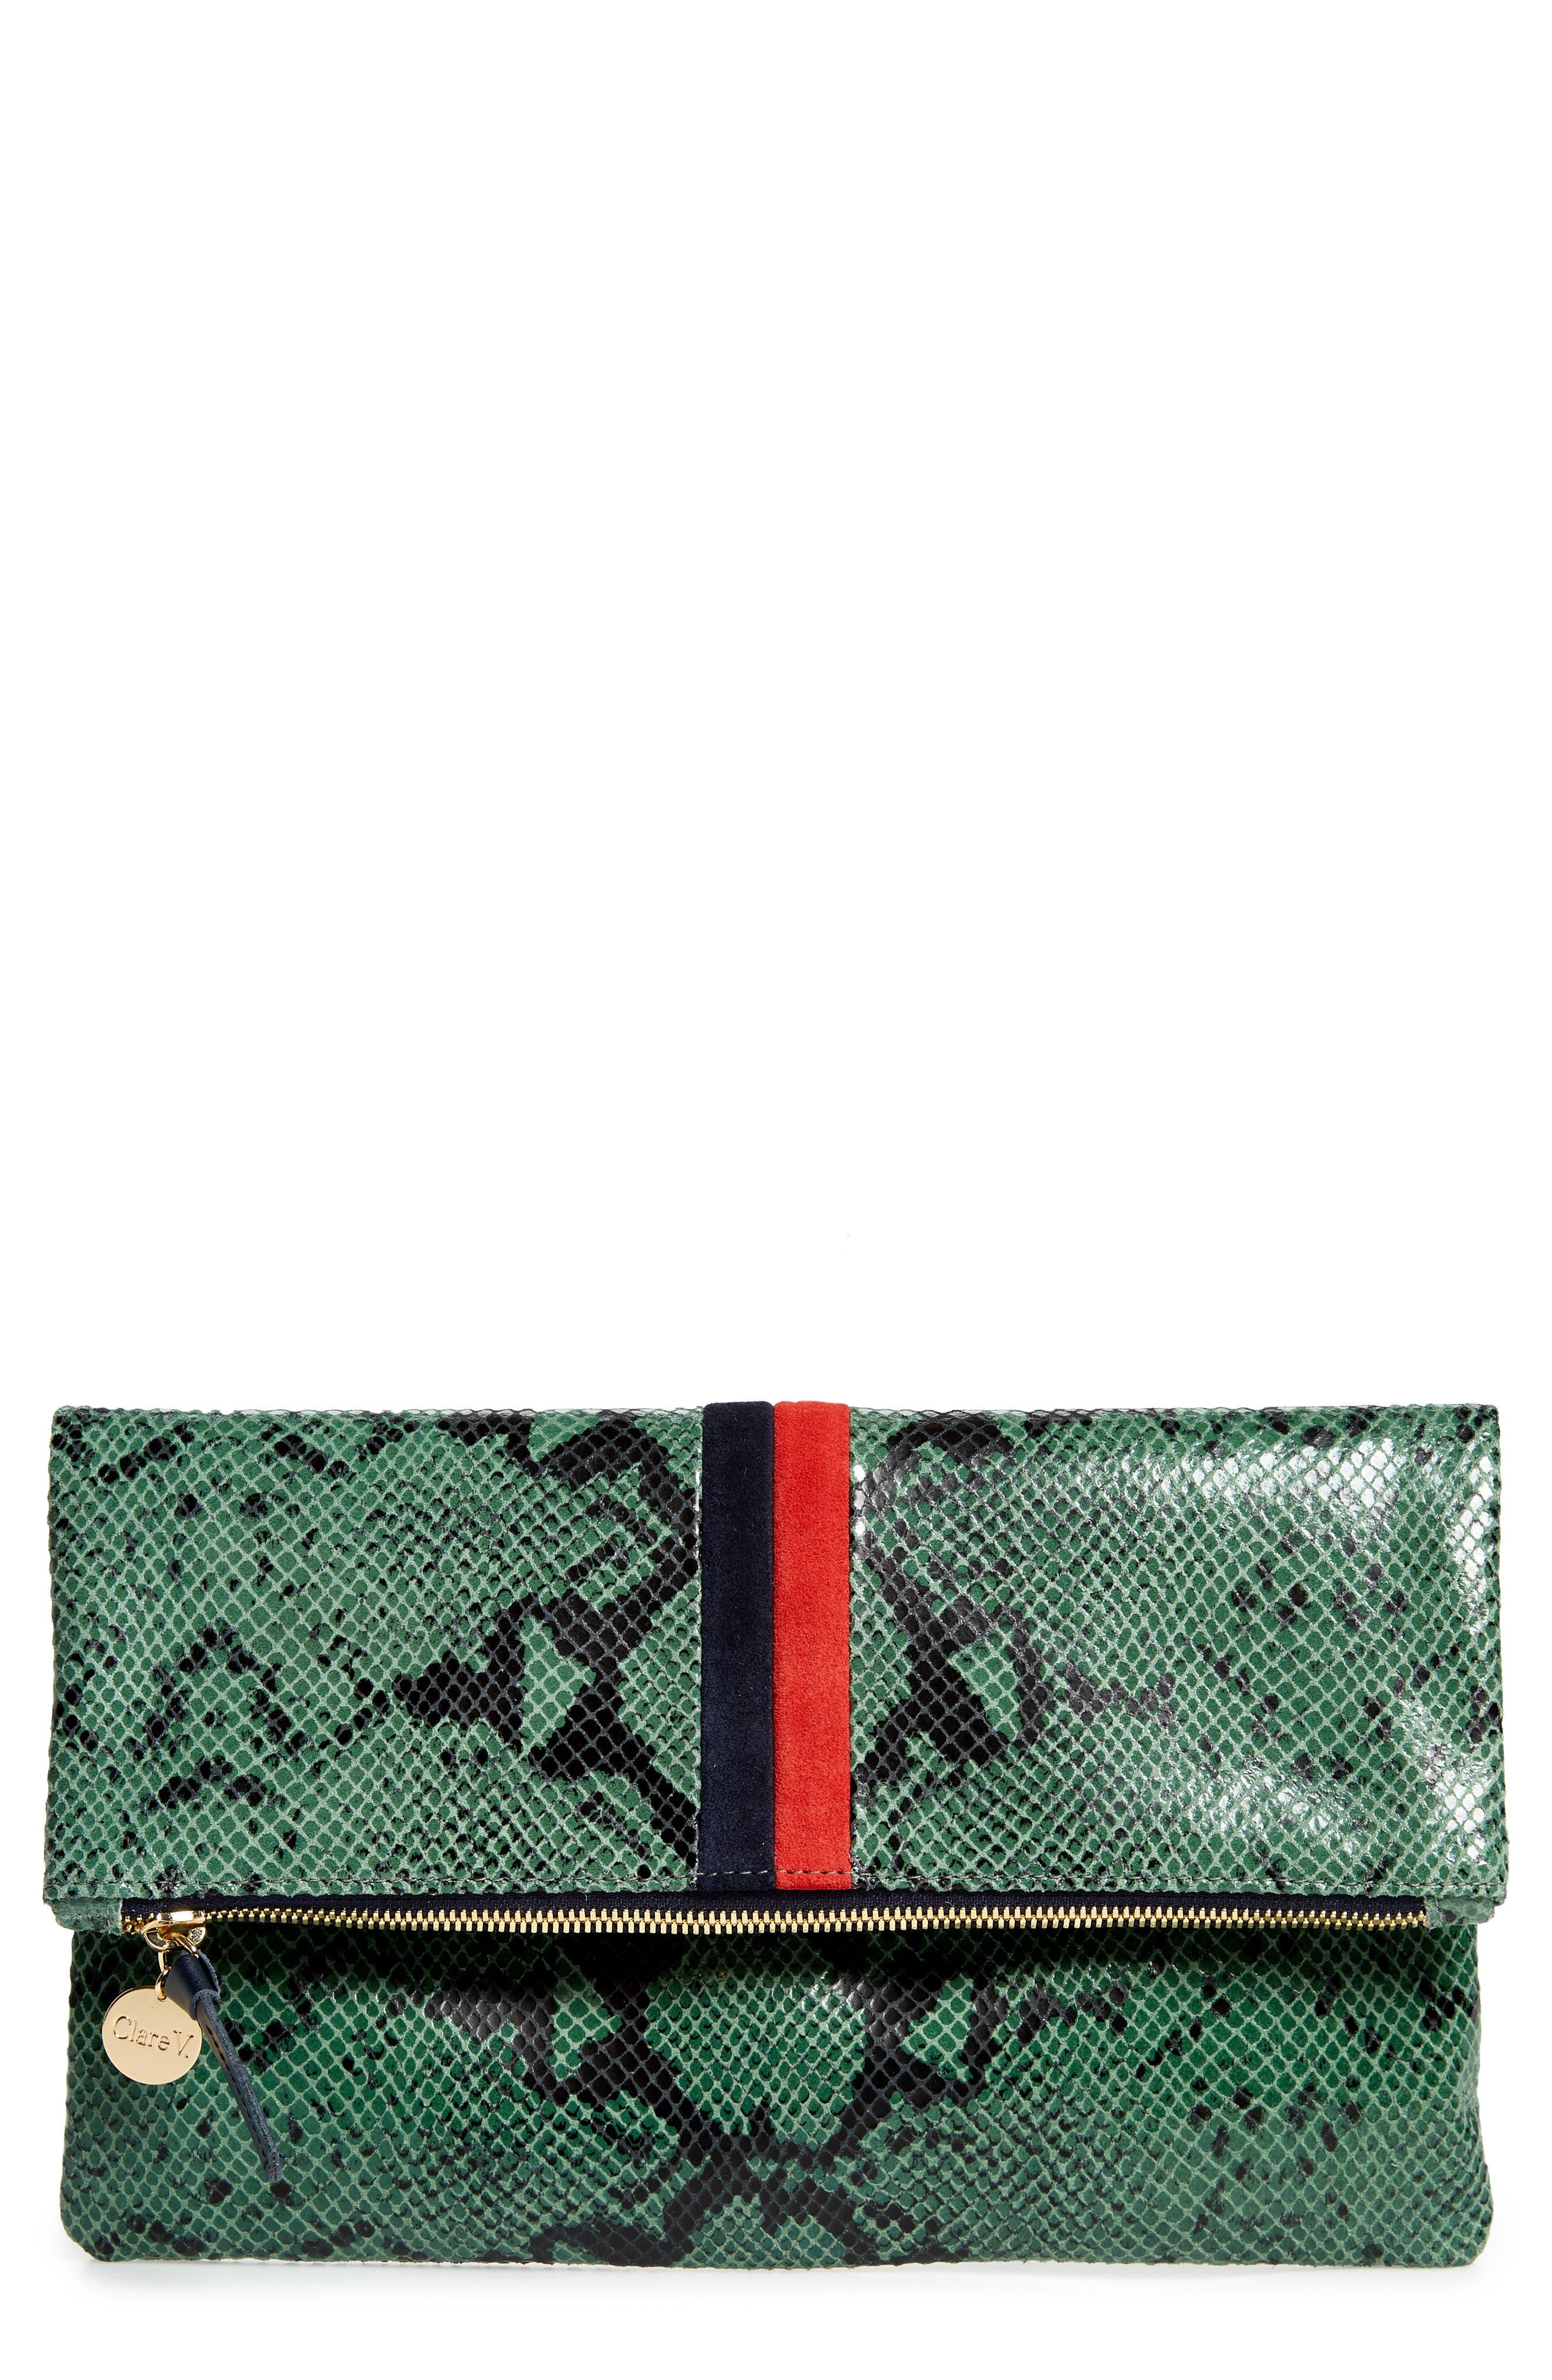 CLARE V Snake Embossed Leather Foldover Clutch - Green in Green Snake Stripe